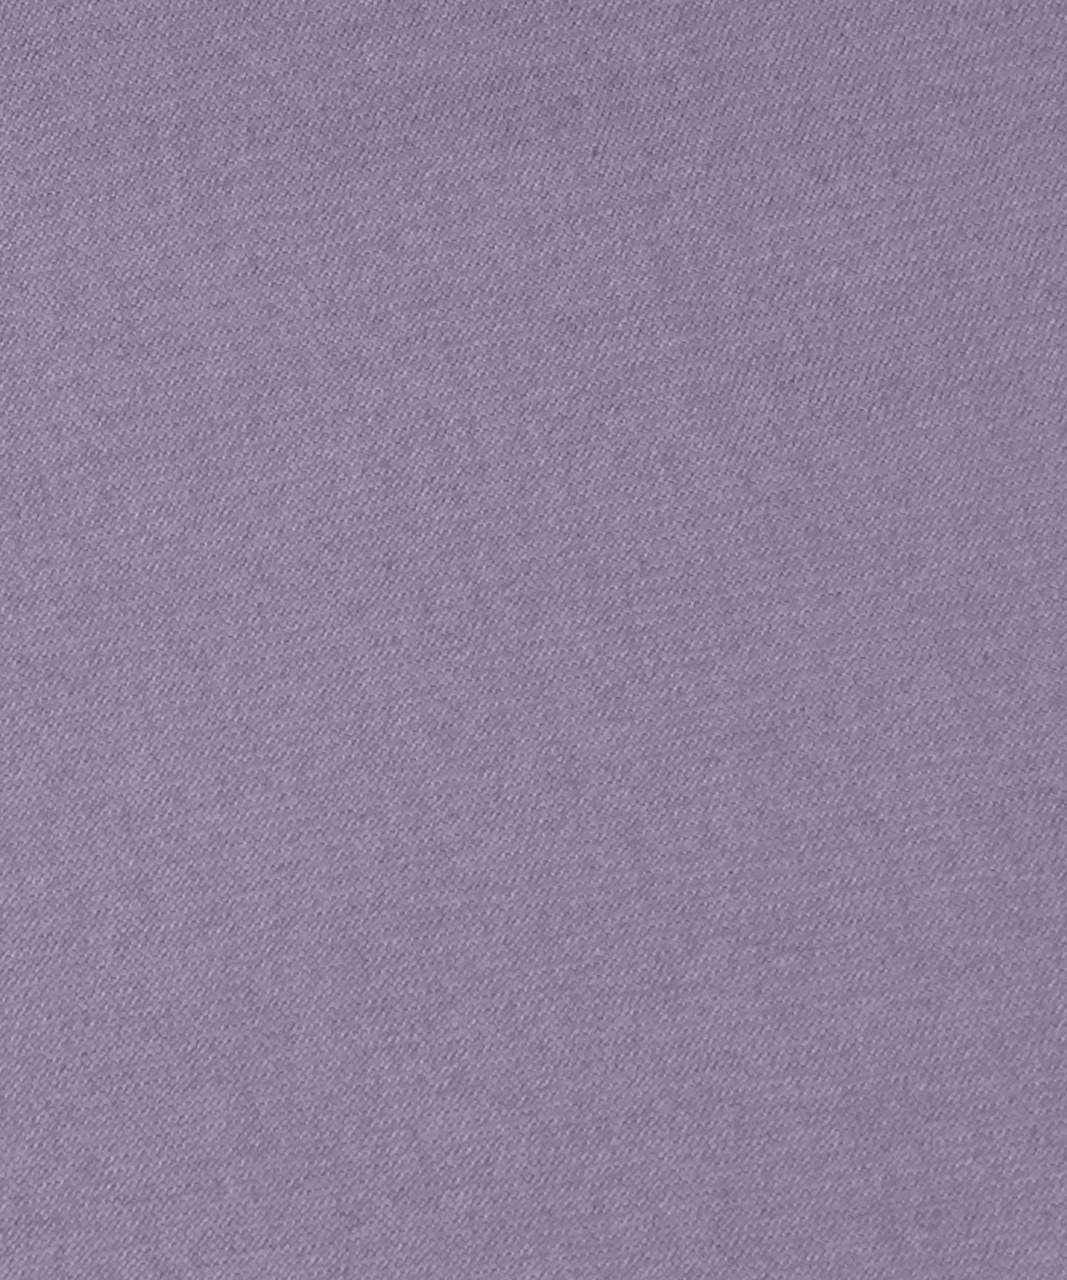 "Lululemon ABC Pant Slim *Swift Cotton 34"" - Graphite Purple"